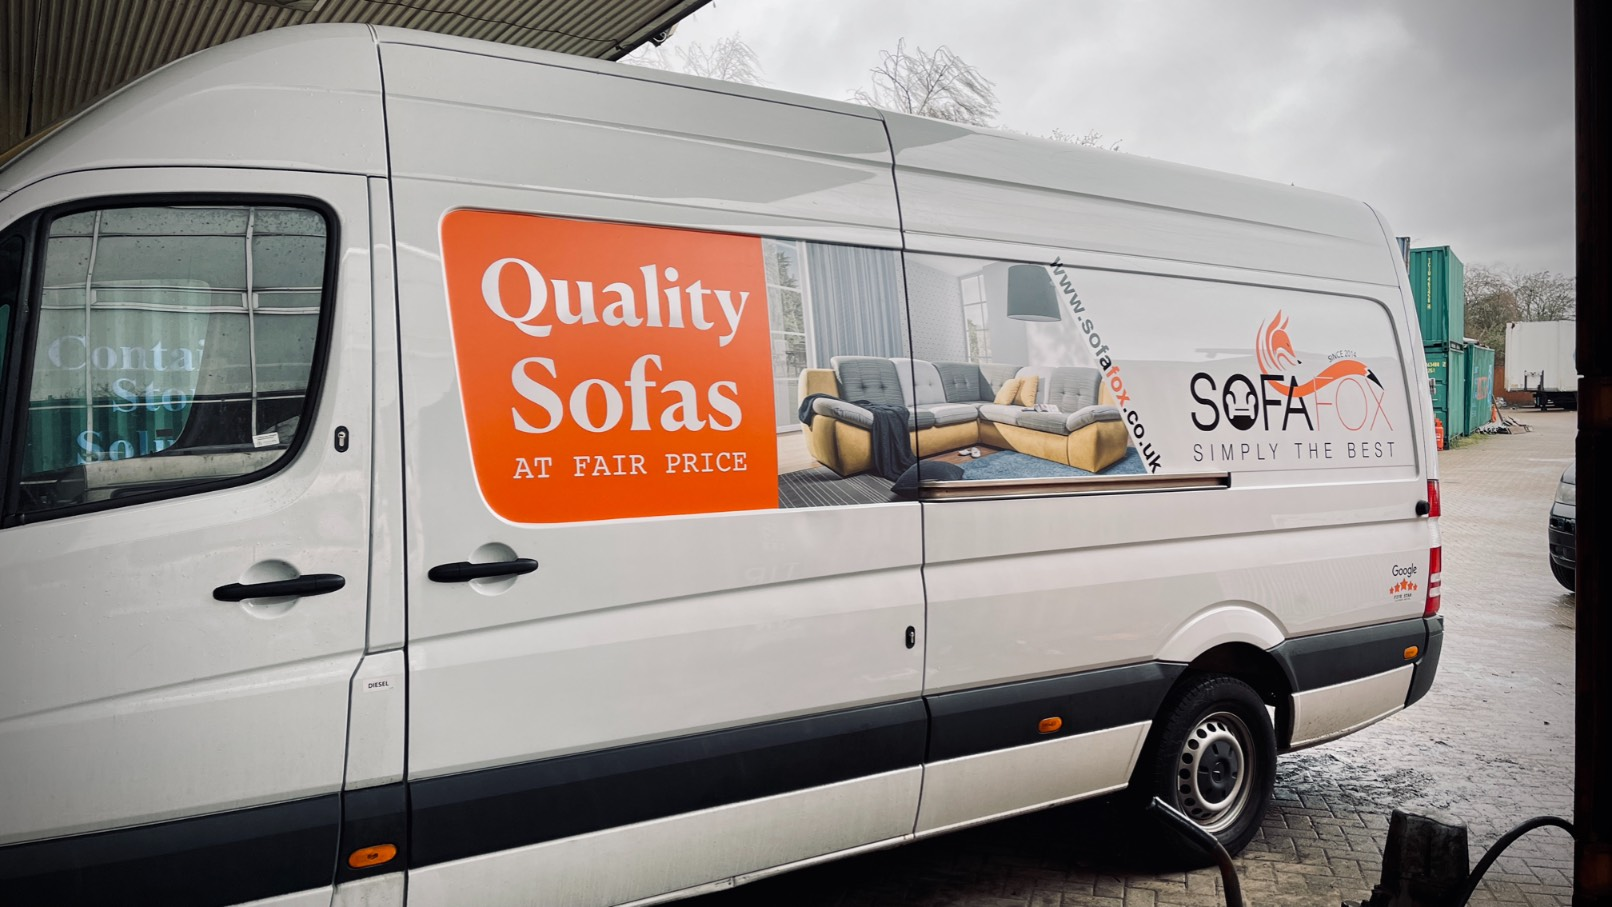 Sofafox - Quality Sofas